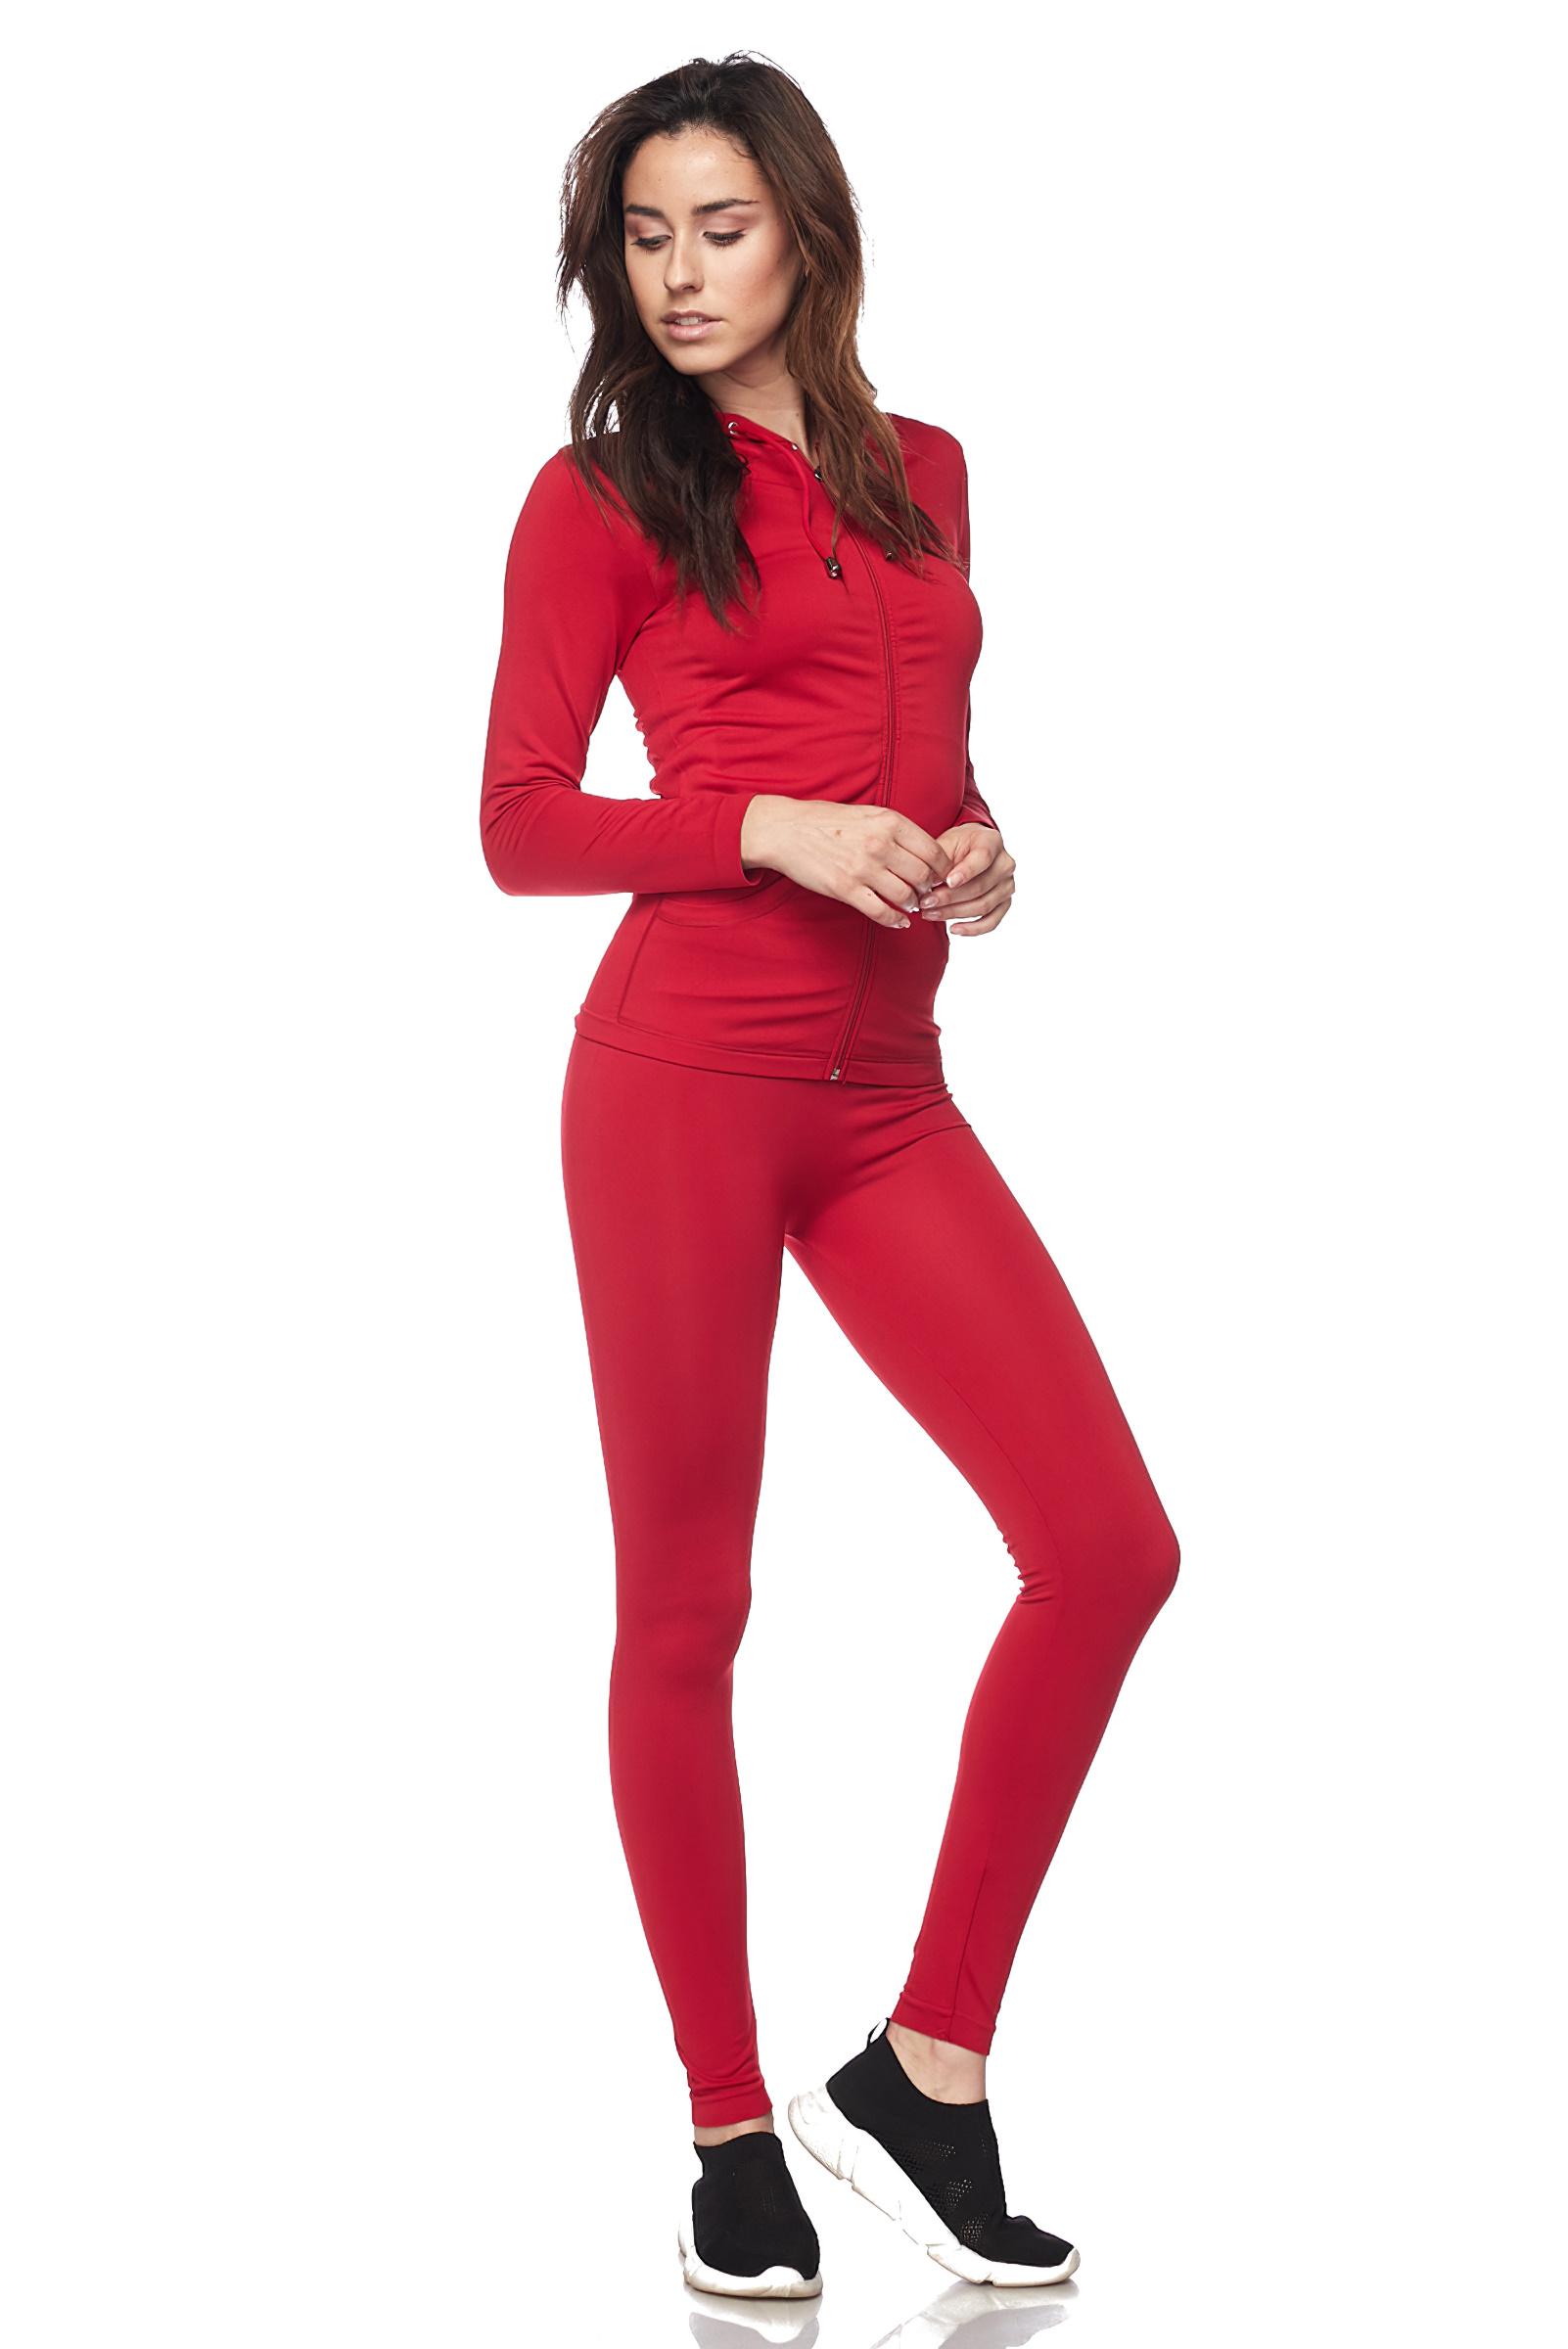 Women-039-s-Juniors-Active-Set-Wear-Zip-Up-Hoodie-and-Legging thumbnail 37